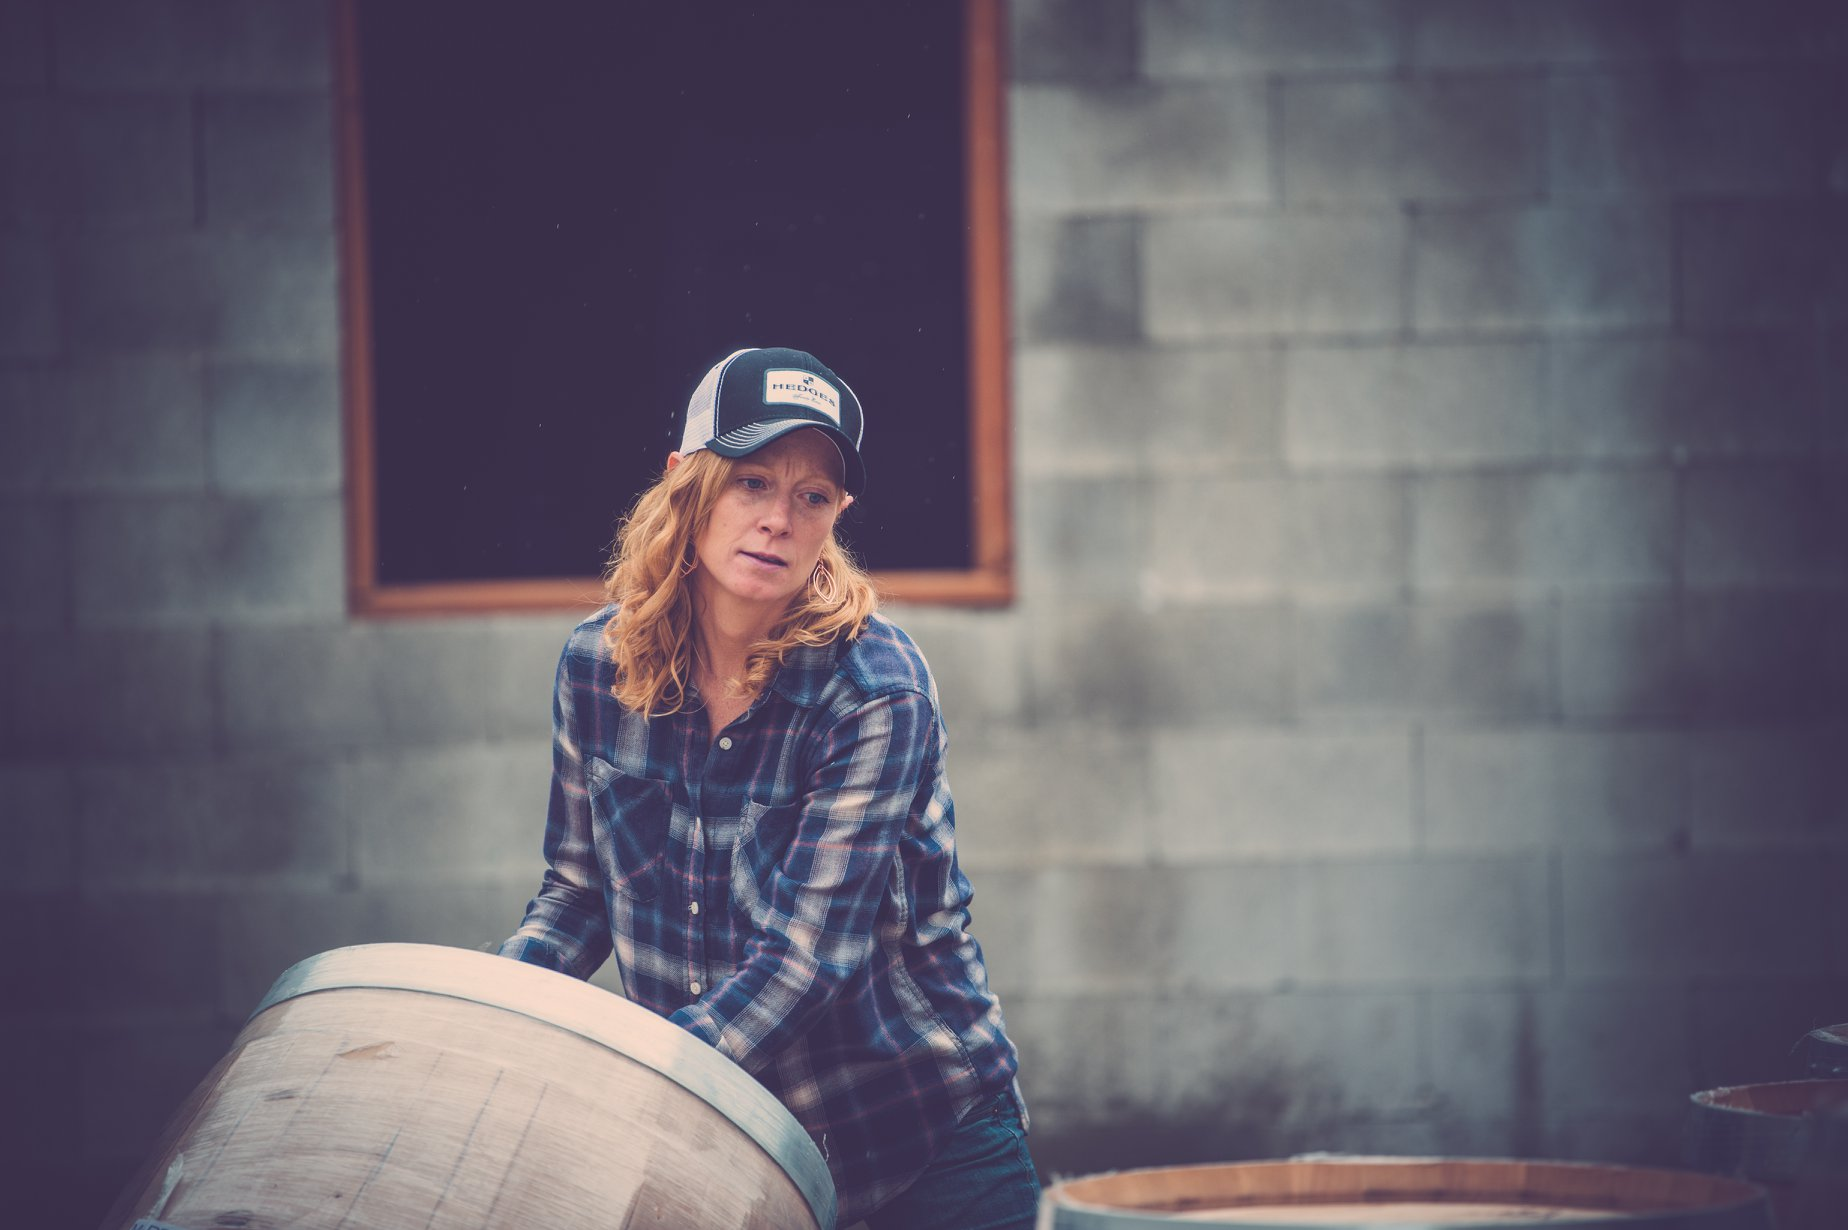 Hedges wine winemaker boss lady.jpg